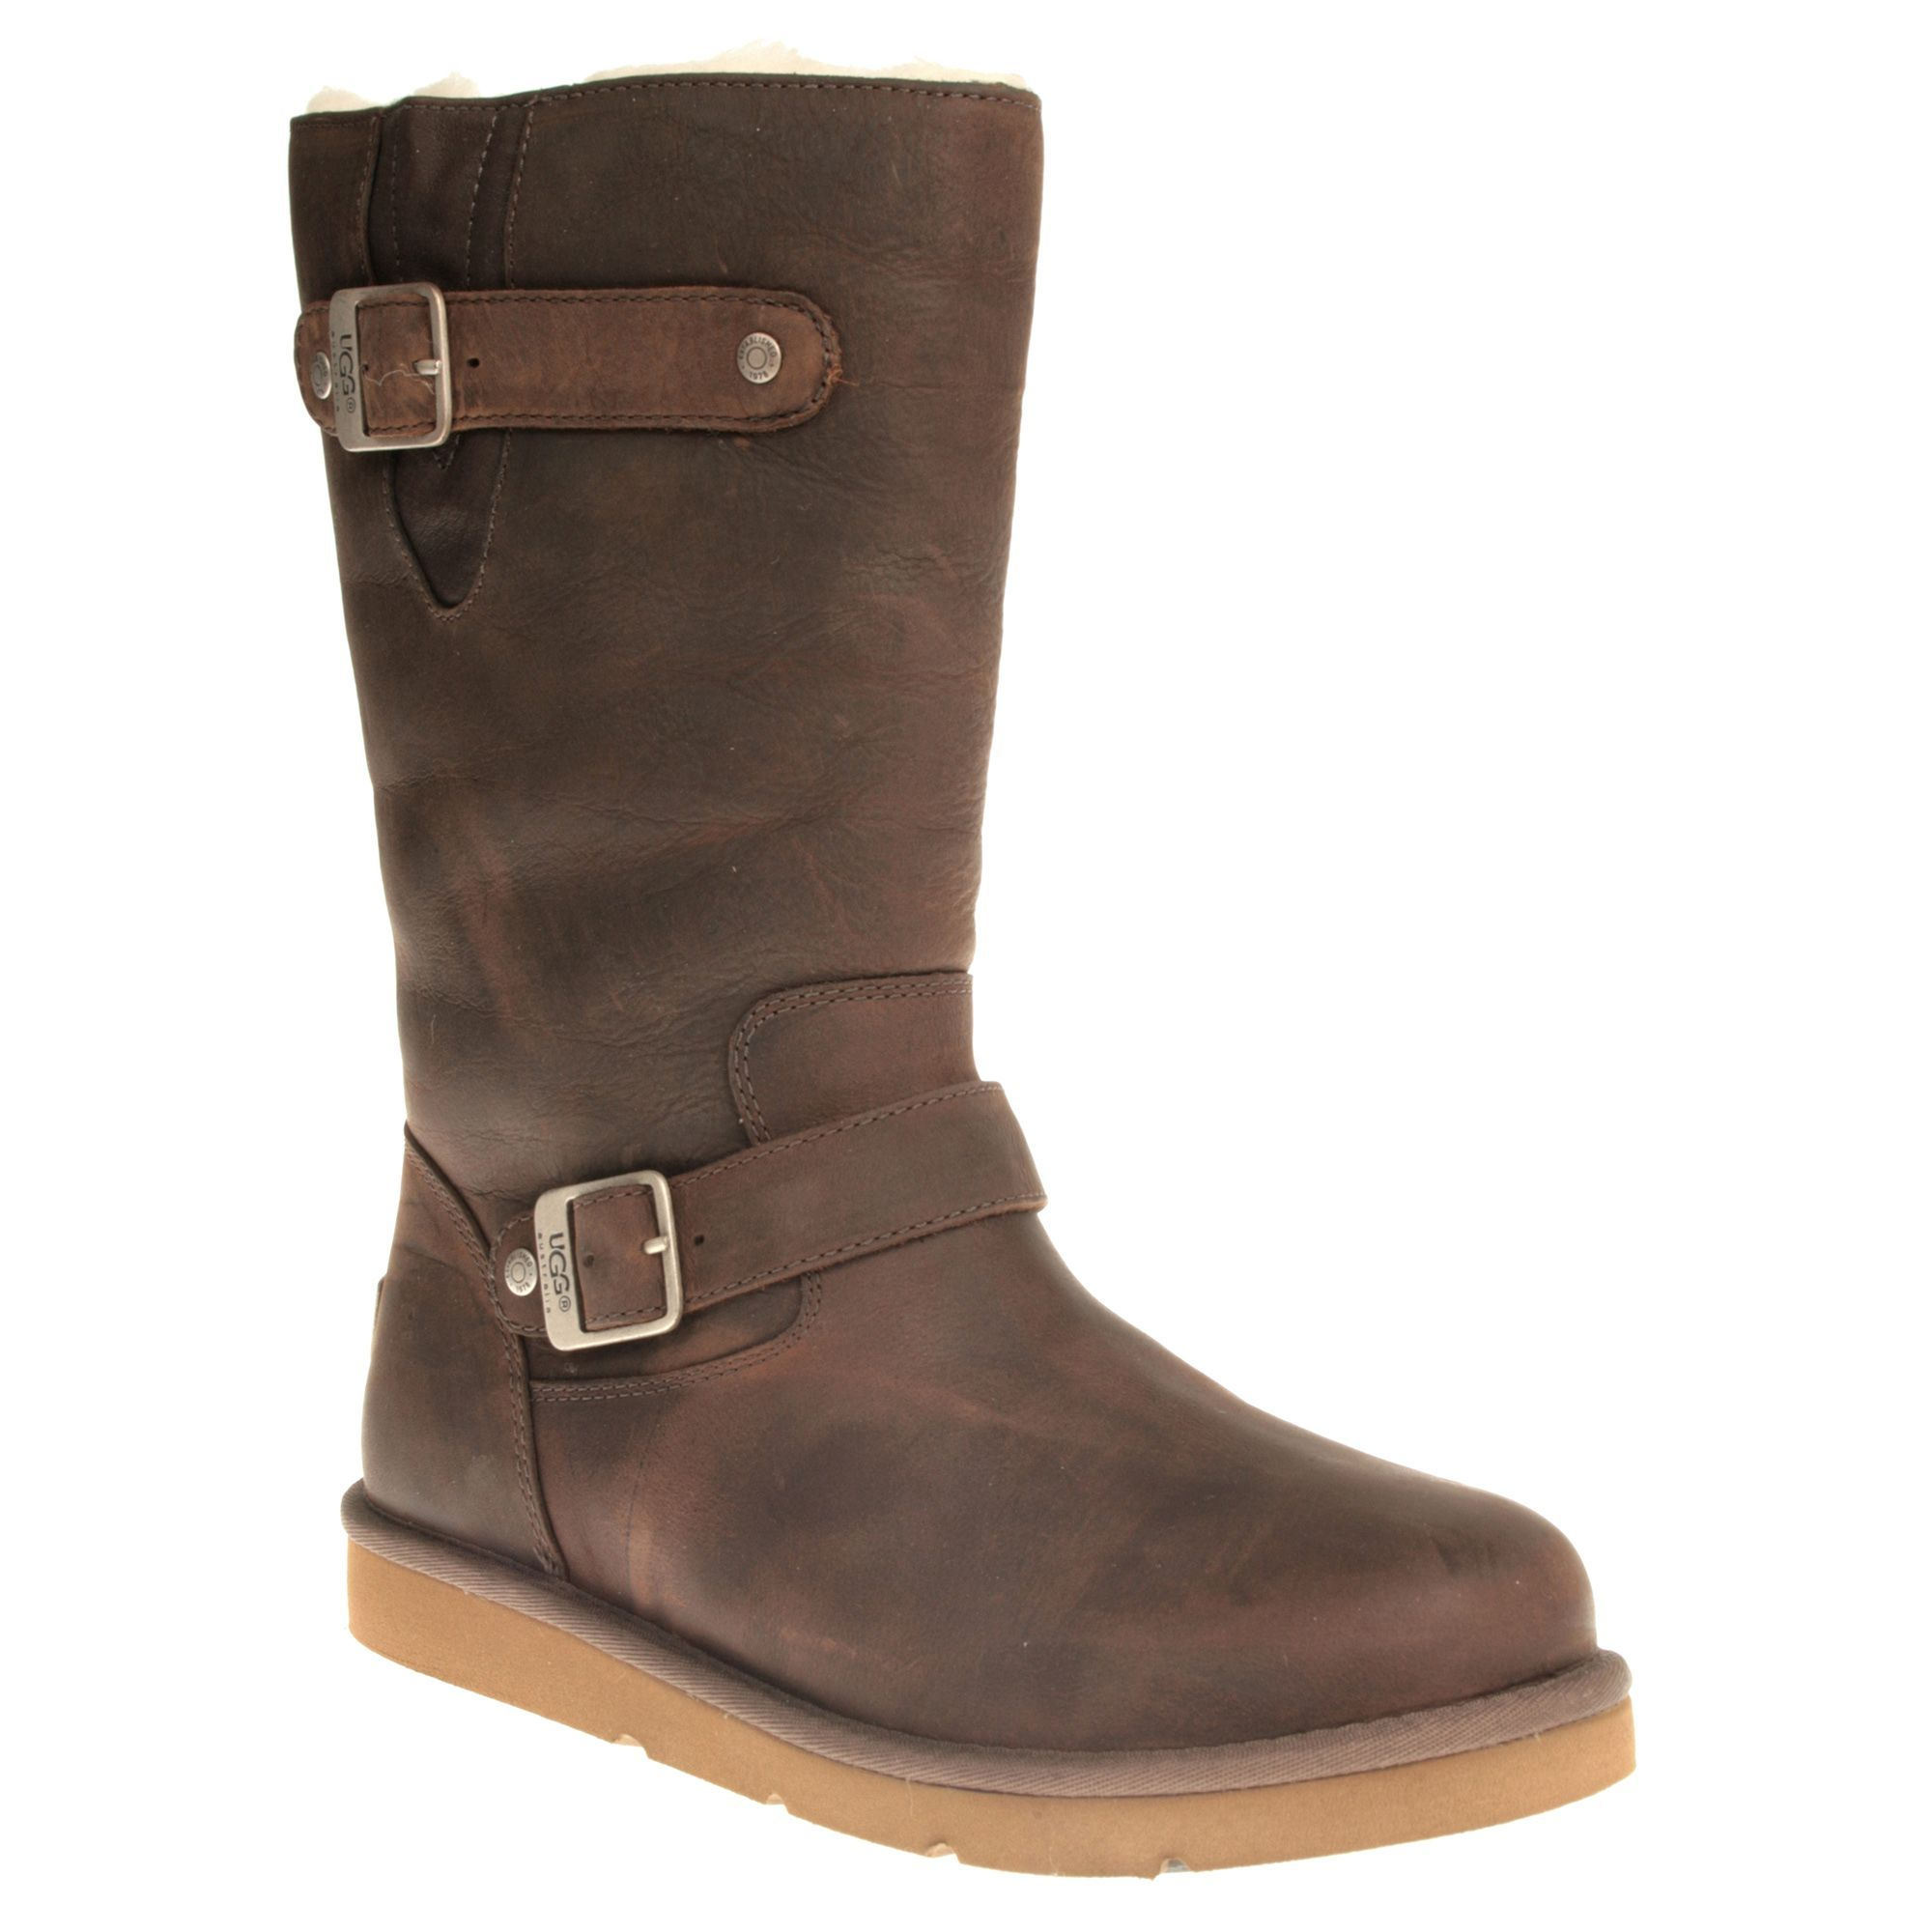 6901d3b944f UGG® Australia Kensington Boots - Women - SOLETRADER OUTLET ...